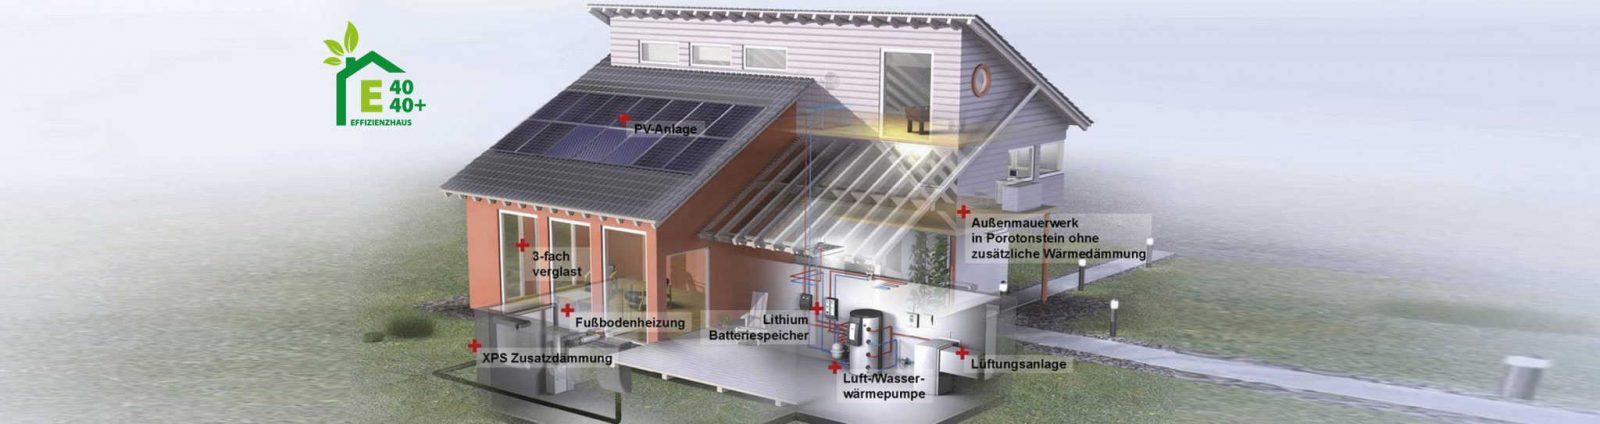 infografik-energieeffizientes-haus-bauen